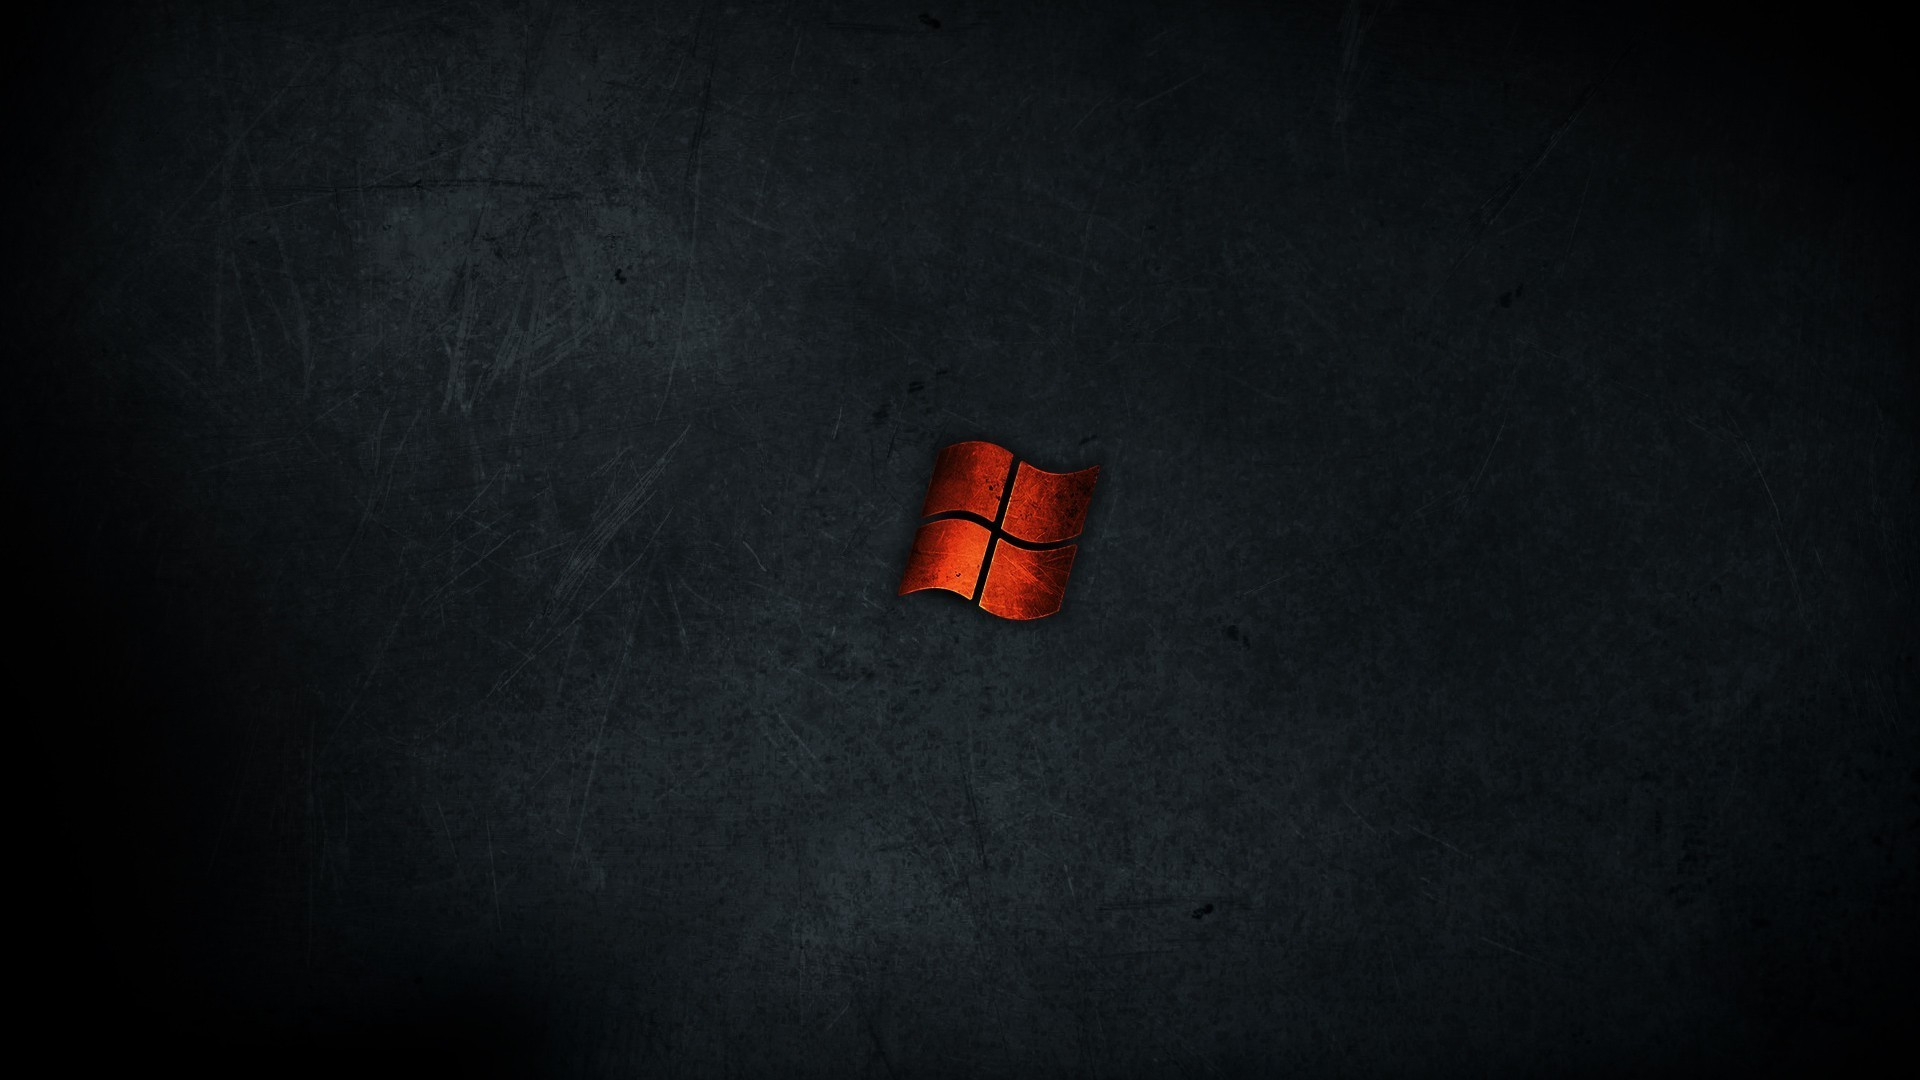 1920x1080 Windows 10 Desktop Is Black 22 Background